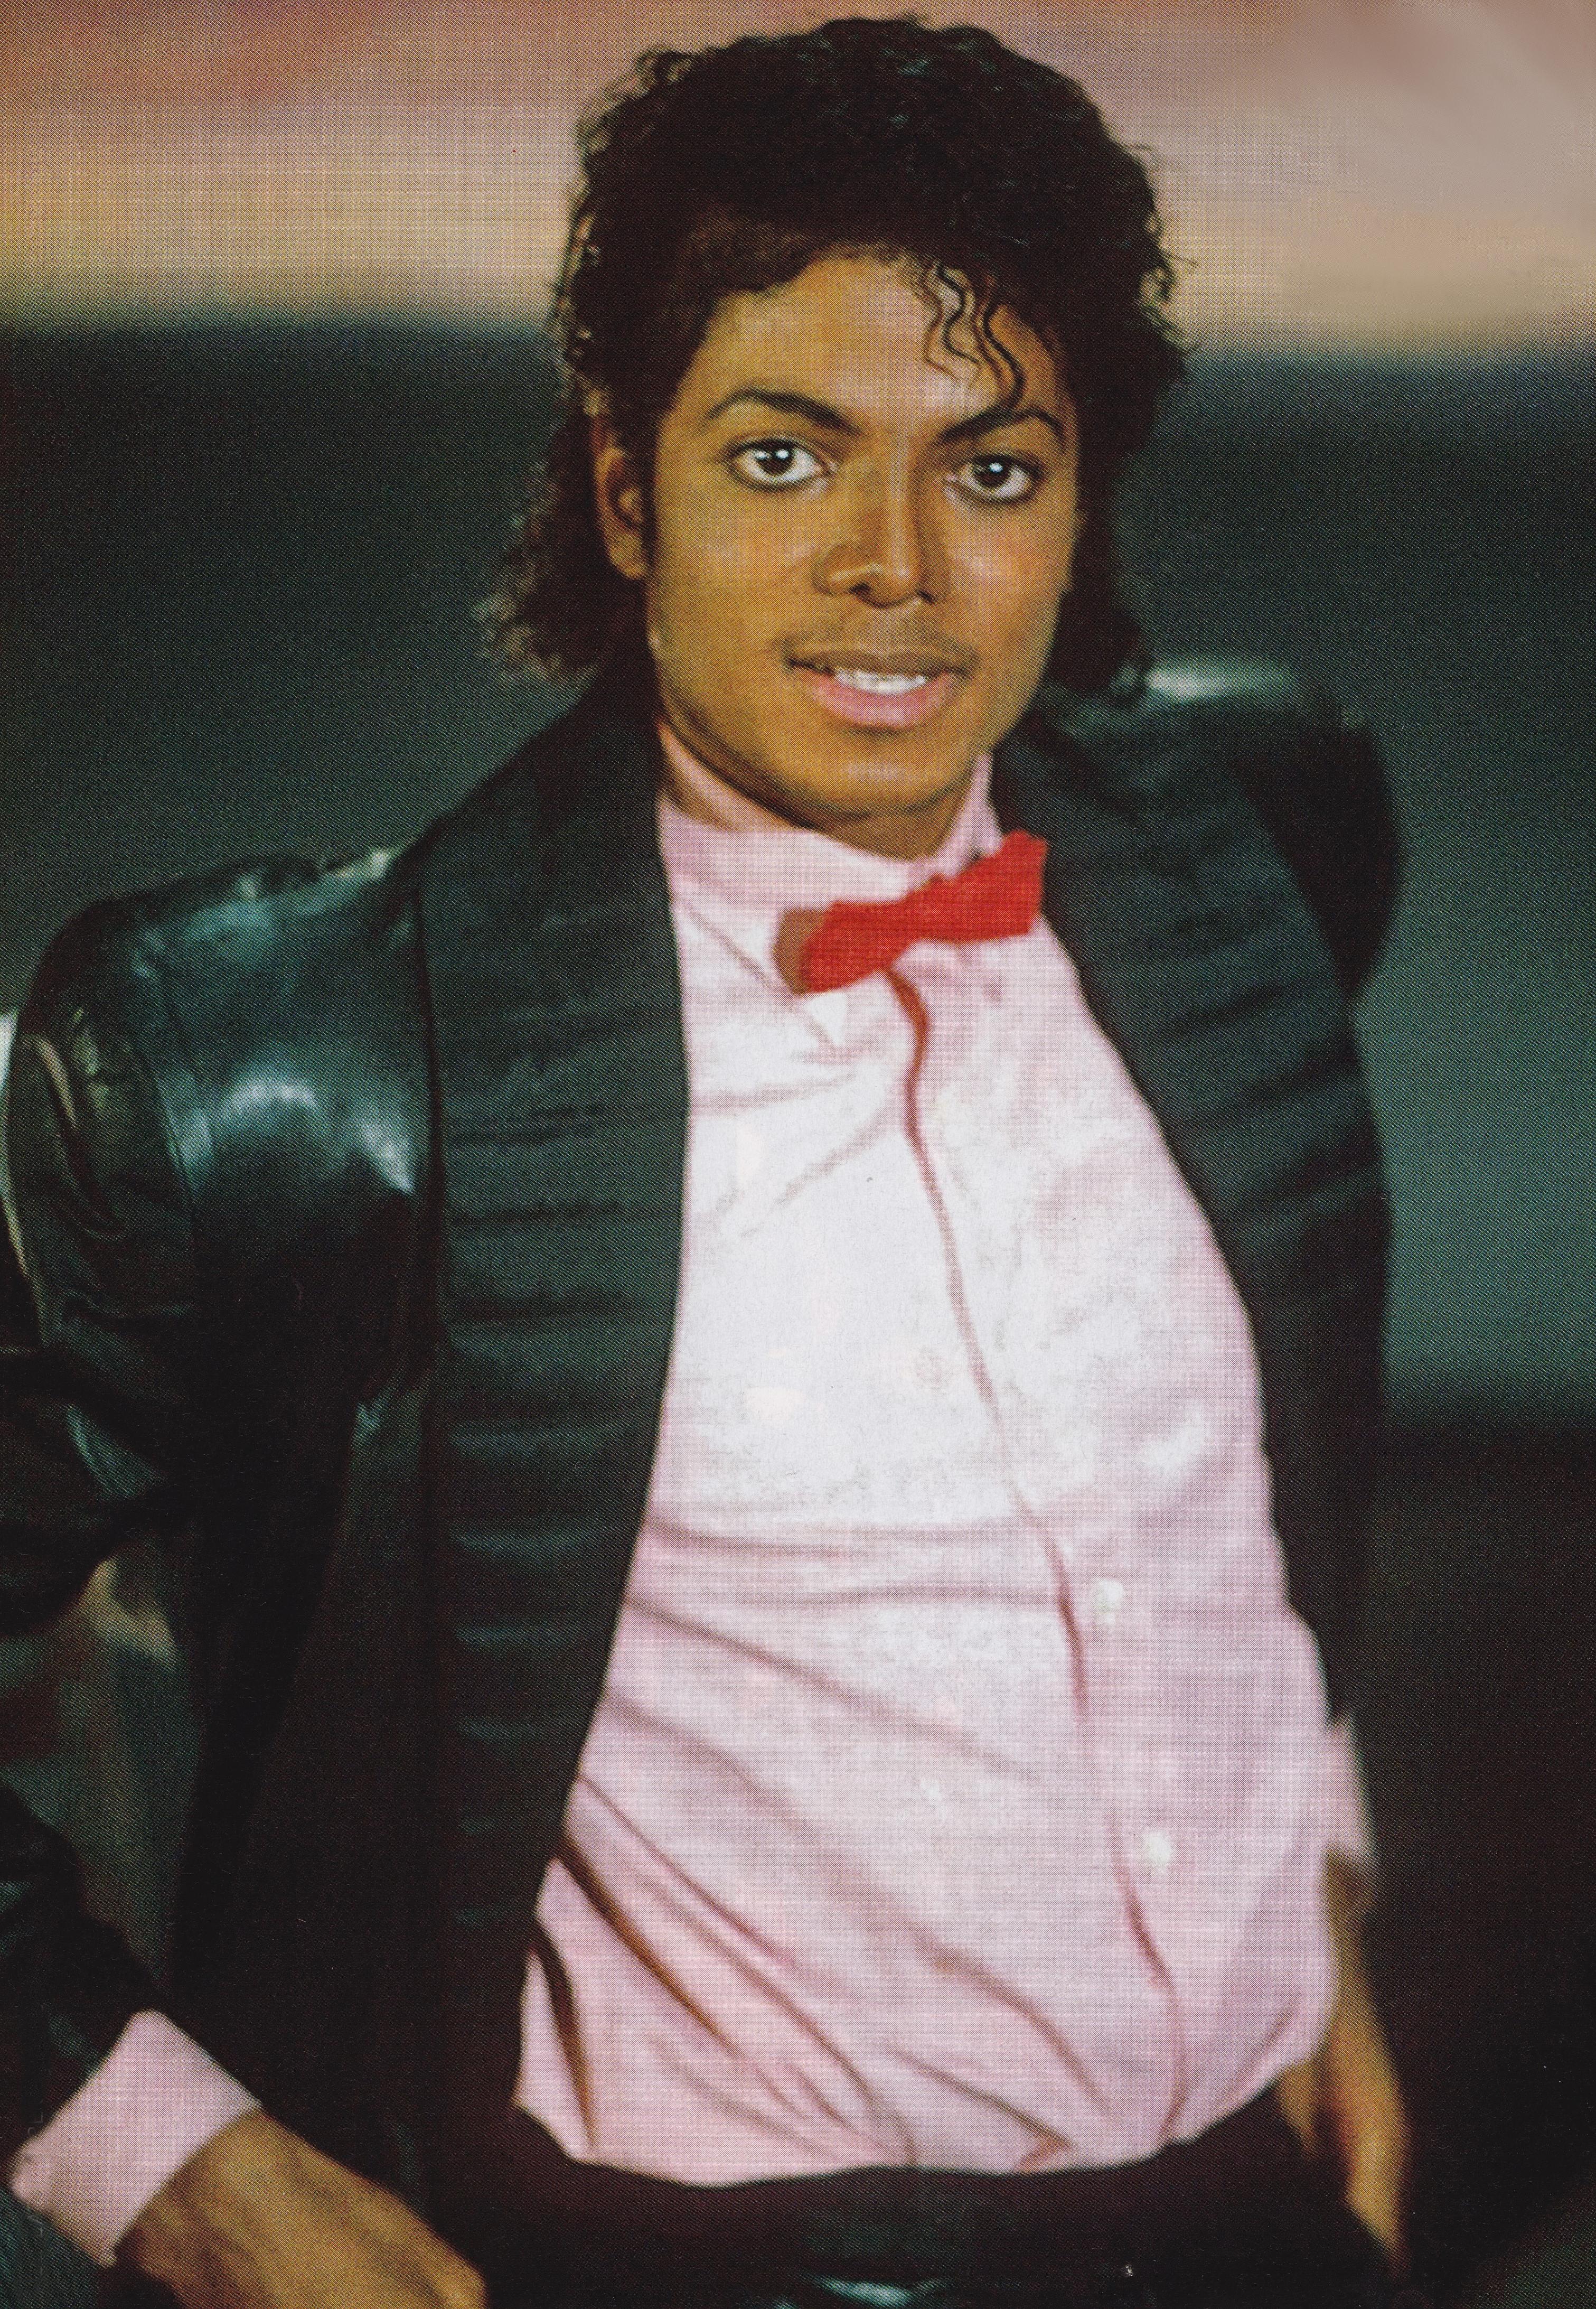 Michael Jackson - HQ Scan - Billie Jean Short Film Set